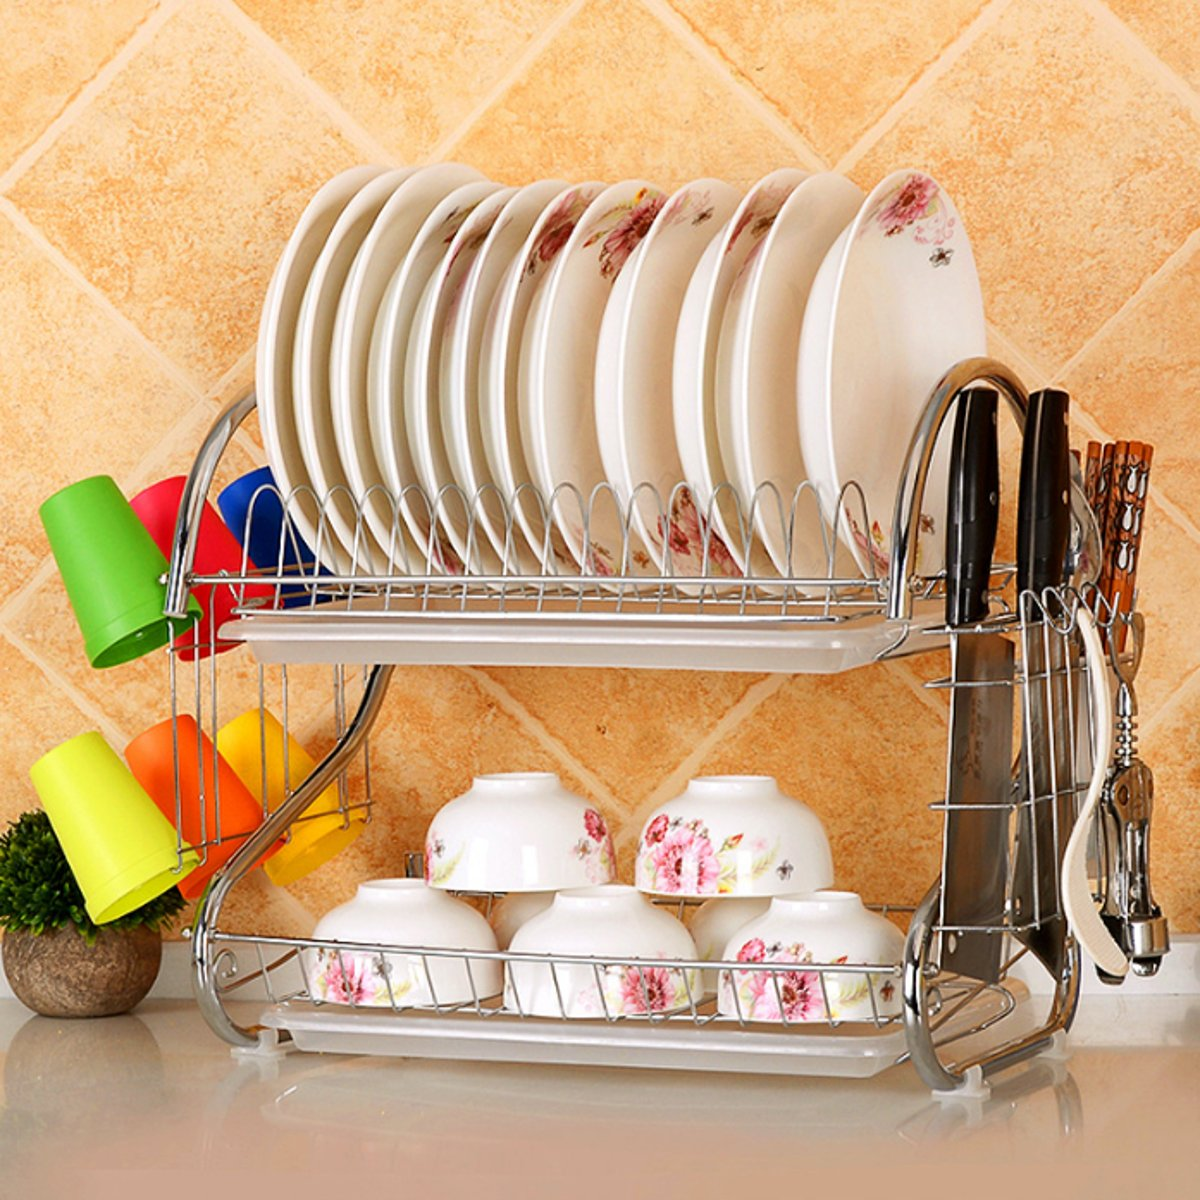 2 Tier Dish Rack Kitchen Storage Holder Drainer Stainless Steel Tableware Bowl Plate Cup Knife Drying Shelf Dinnerware Organizer